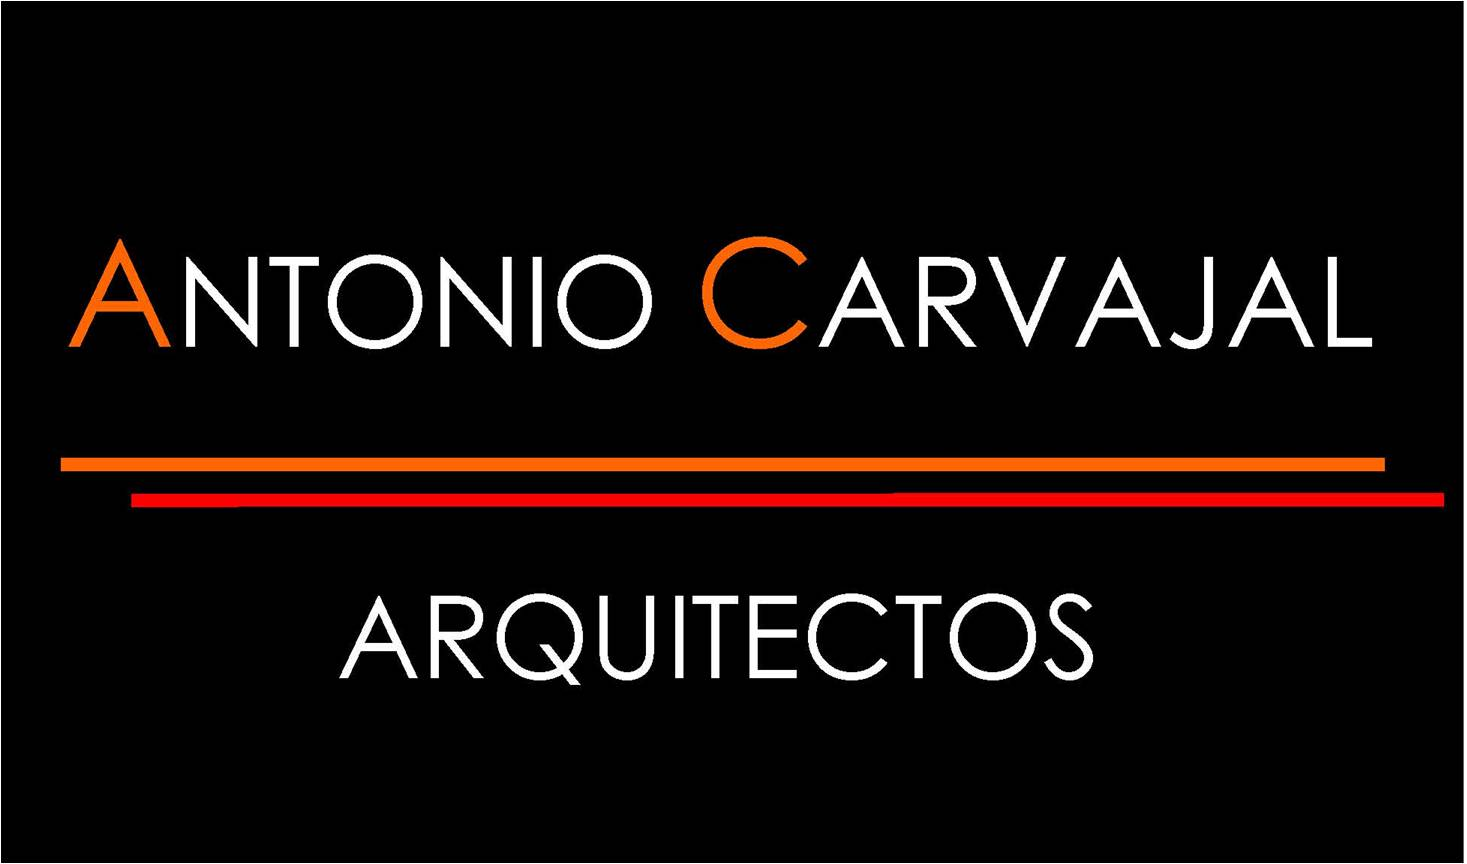 Antonio Carvajal Arquitectos